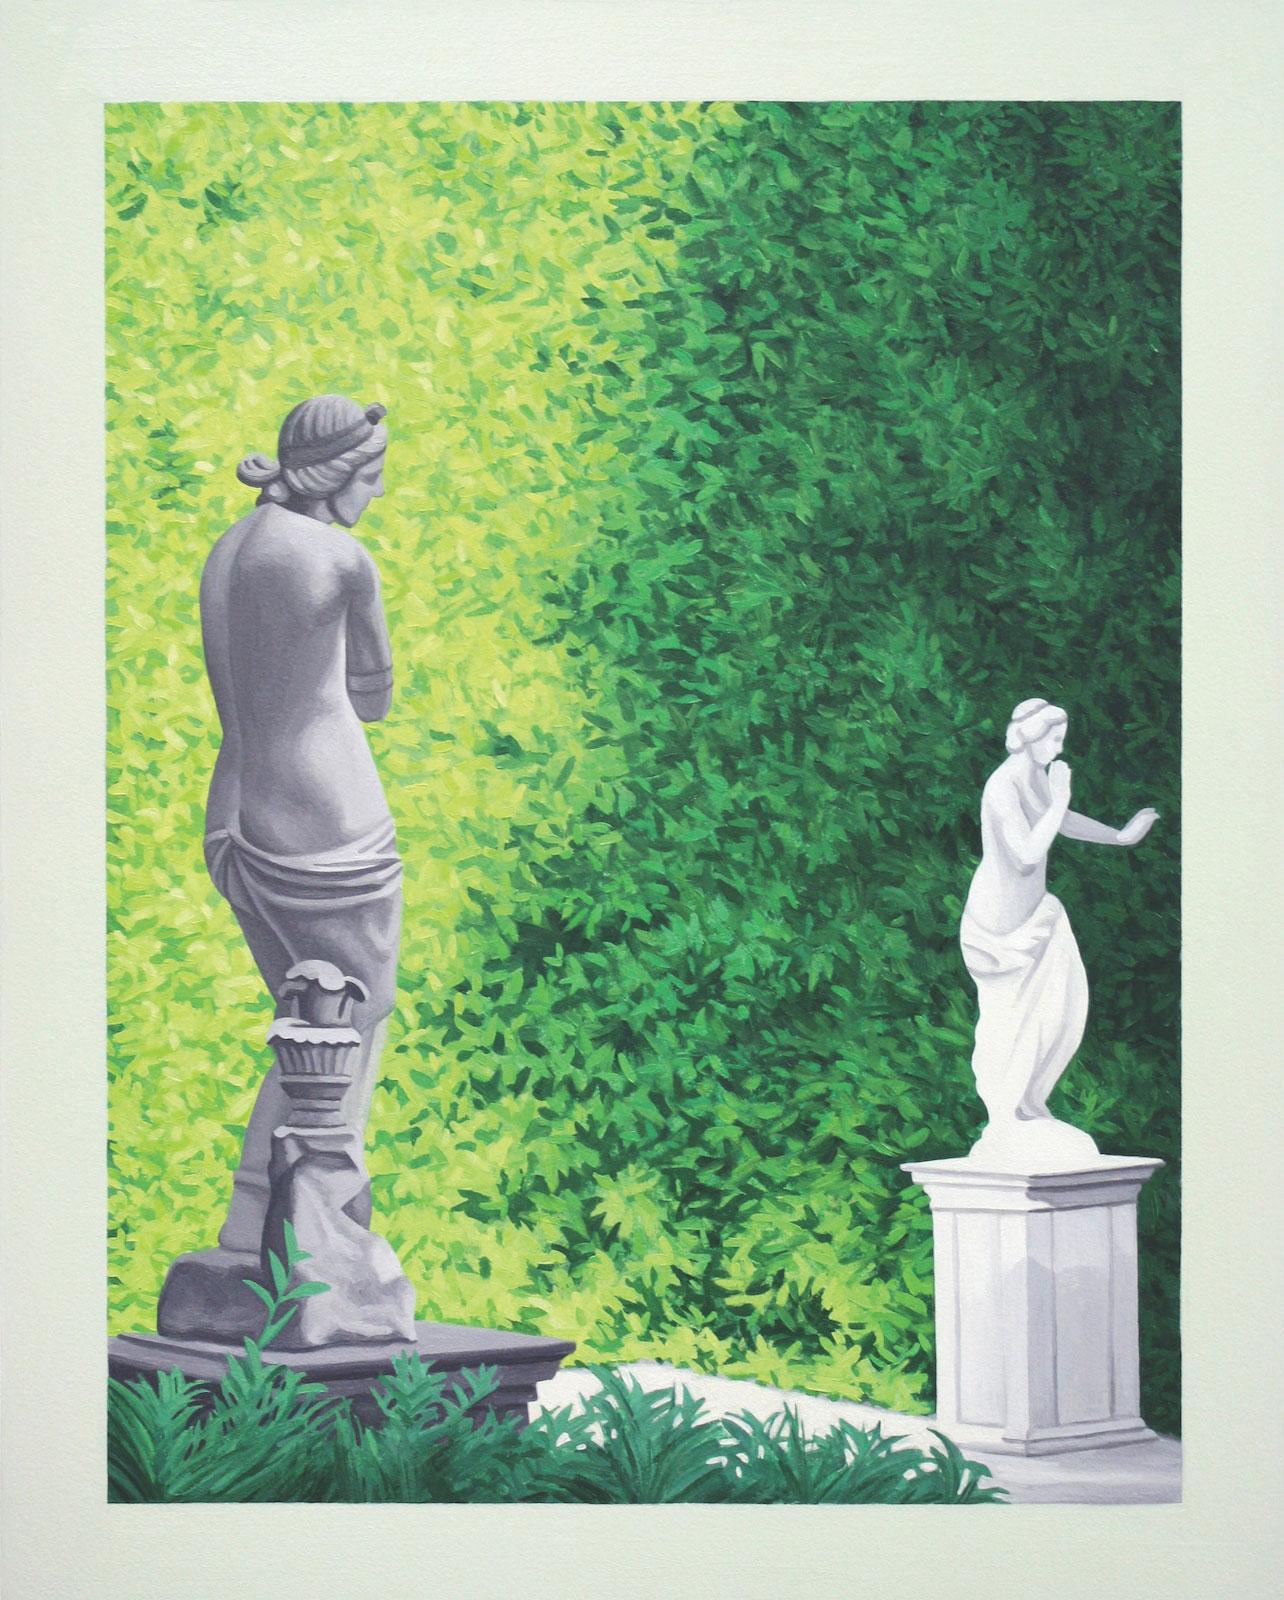 "Johan Furåker, ""The Boboli Gardens"", 2012, oil on mdf, 46 x 36 cm"